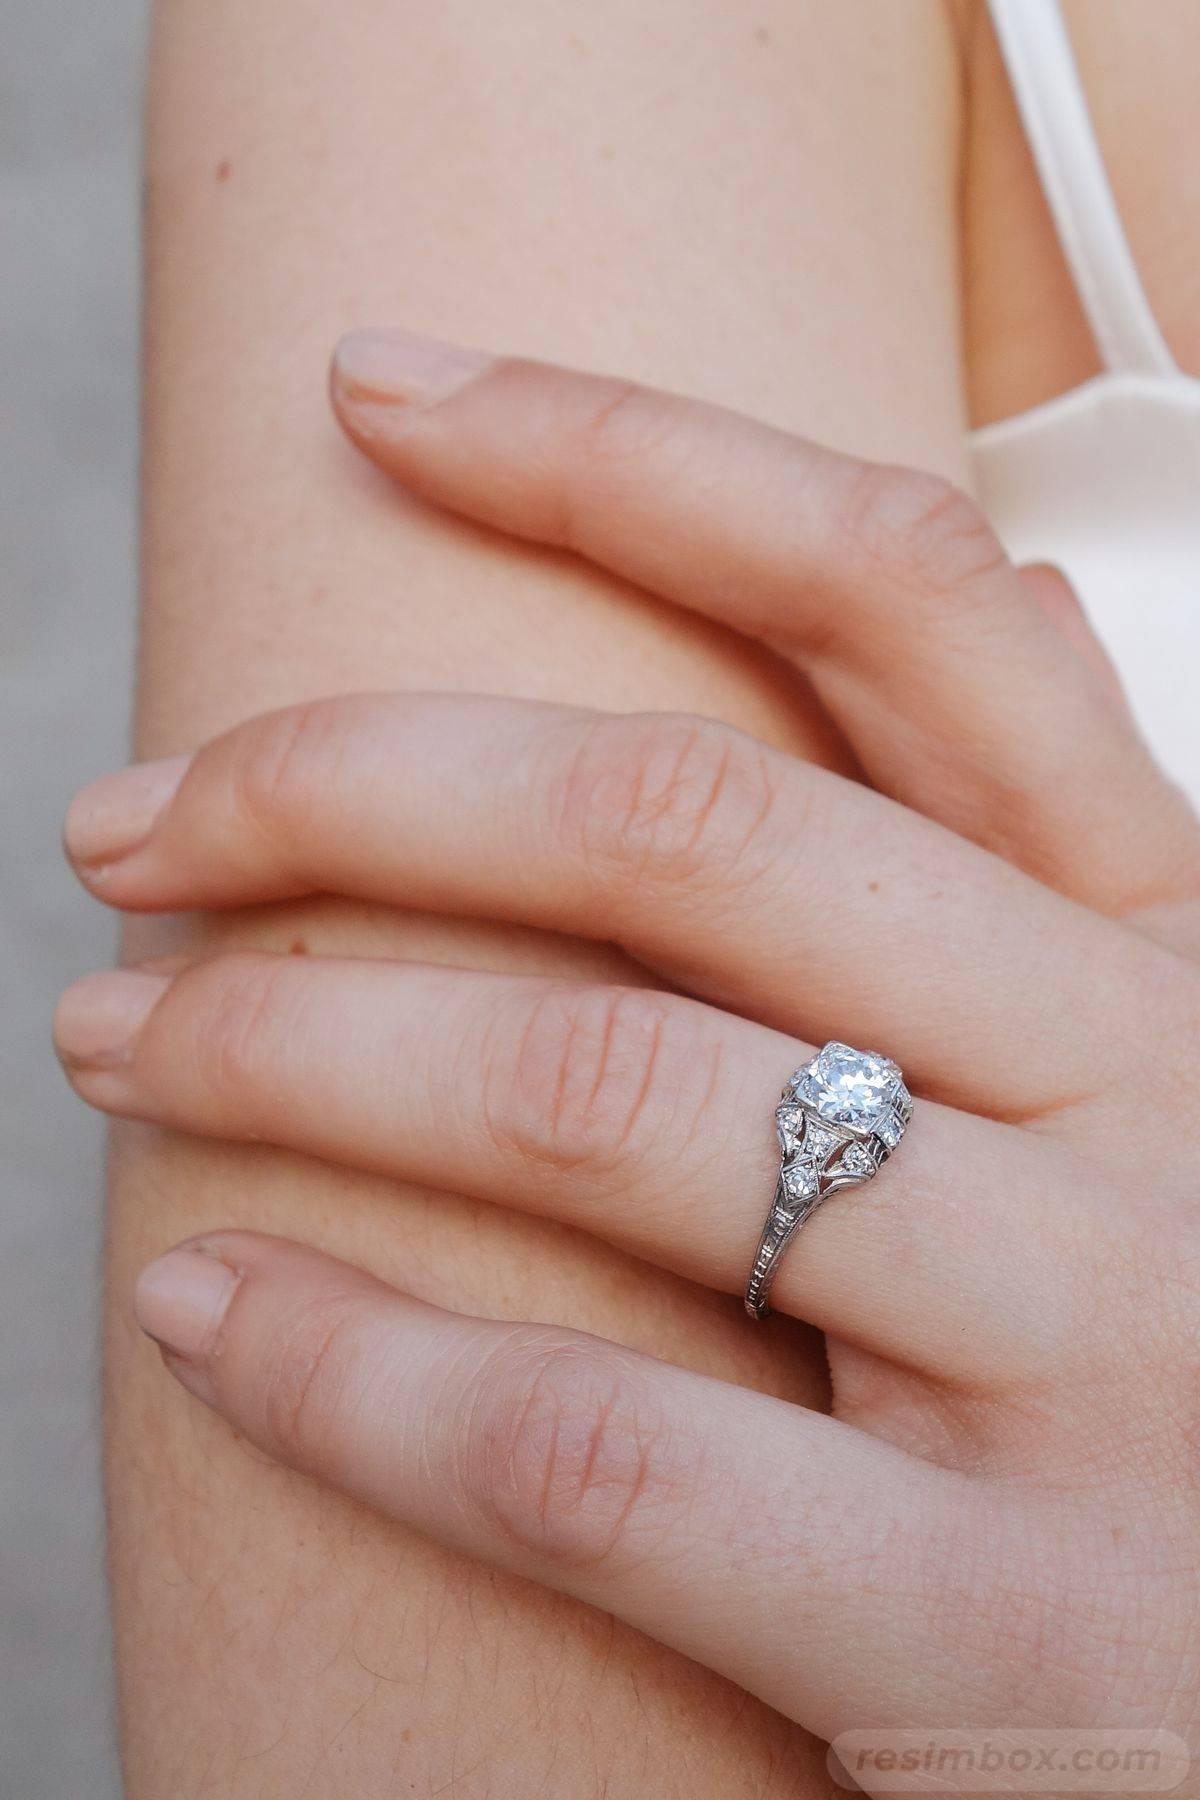 Art deco engagement ring-22306960641542431